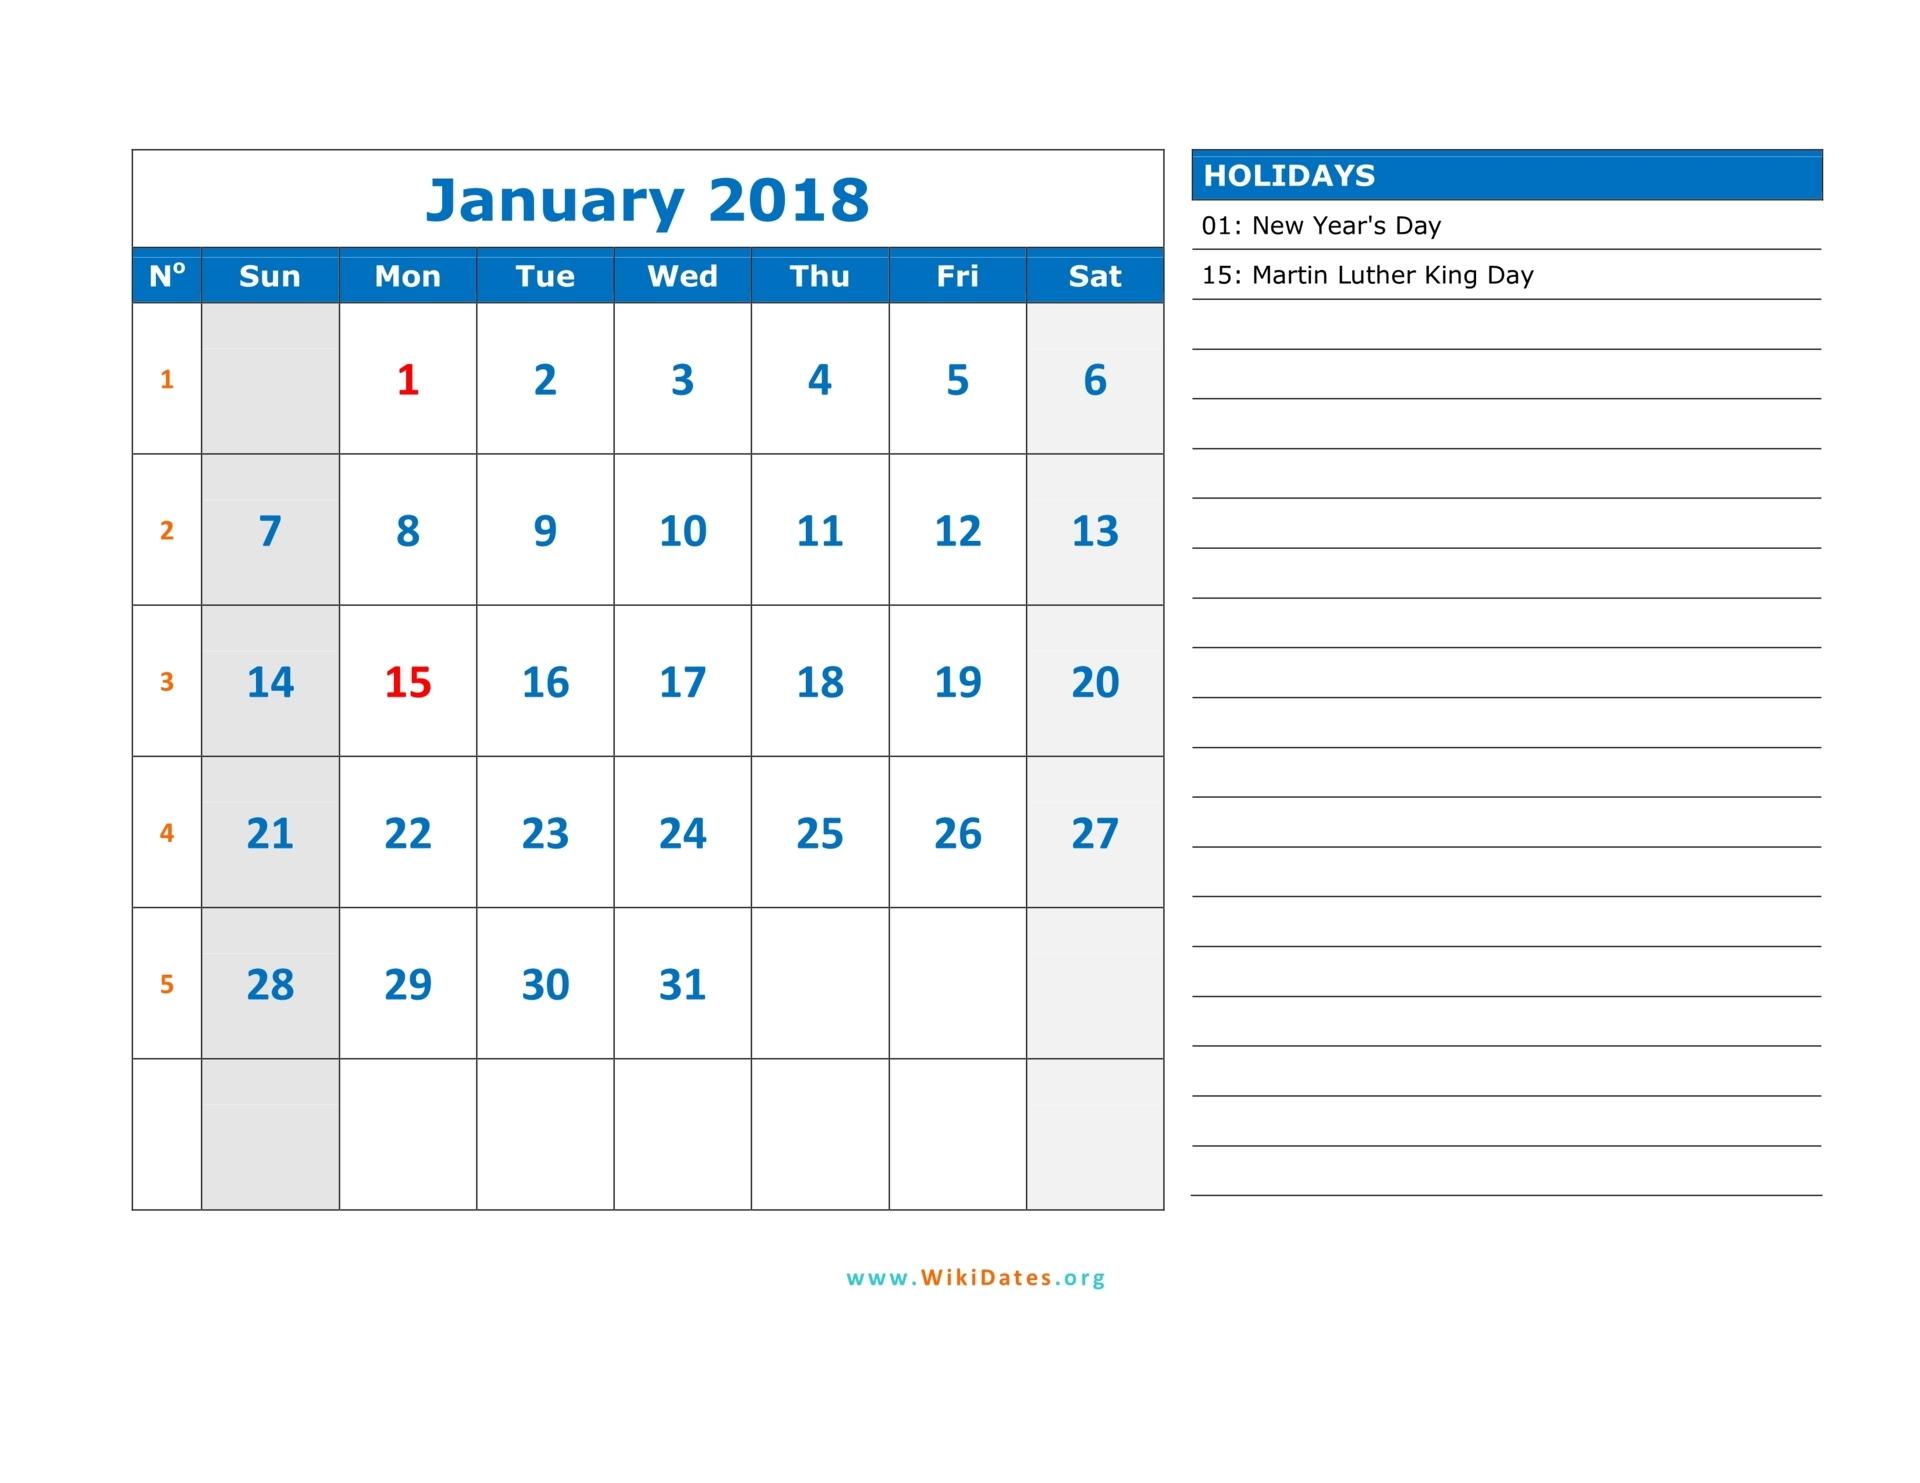 January 2018 Calendar   WikiDates.org